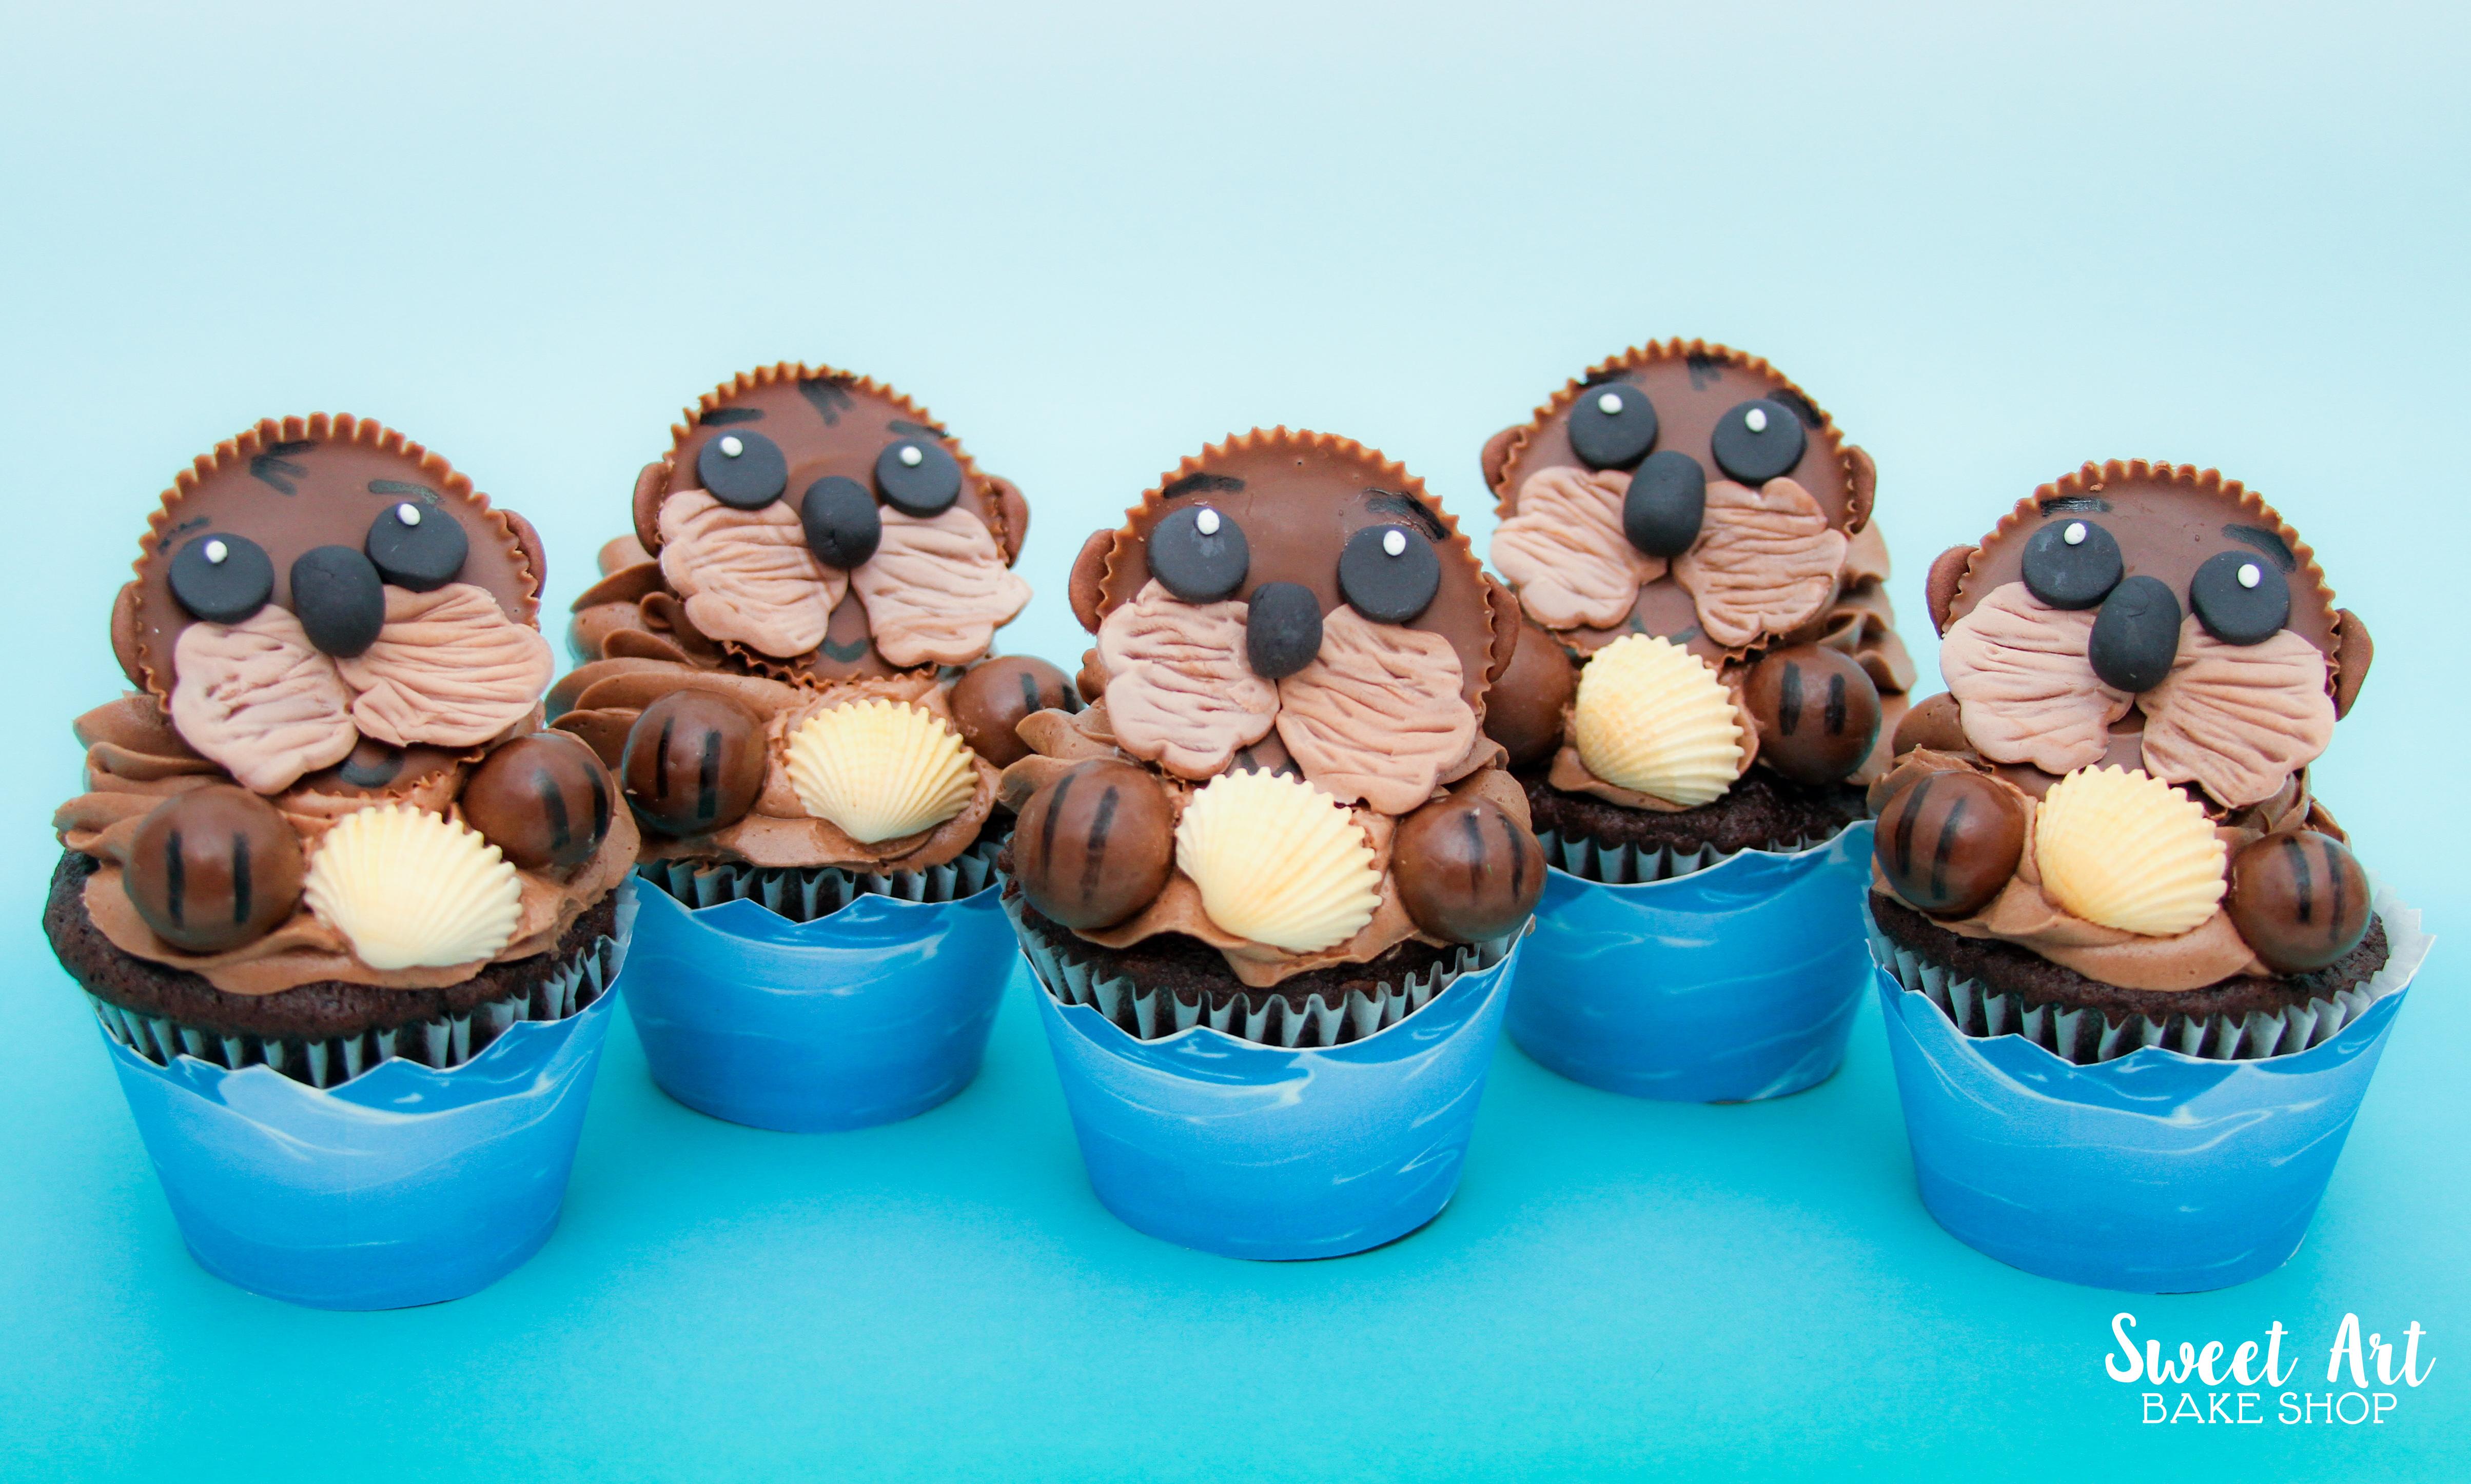 Sea Otter Cupcakes